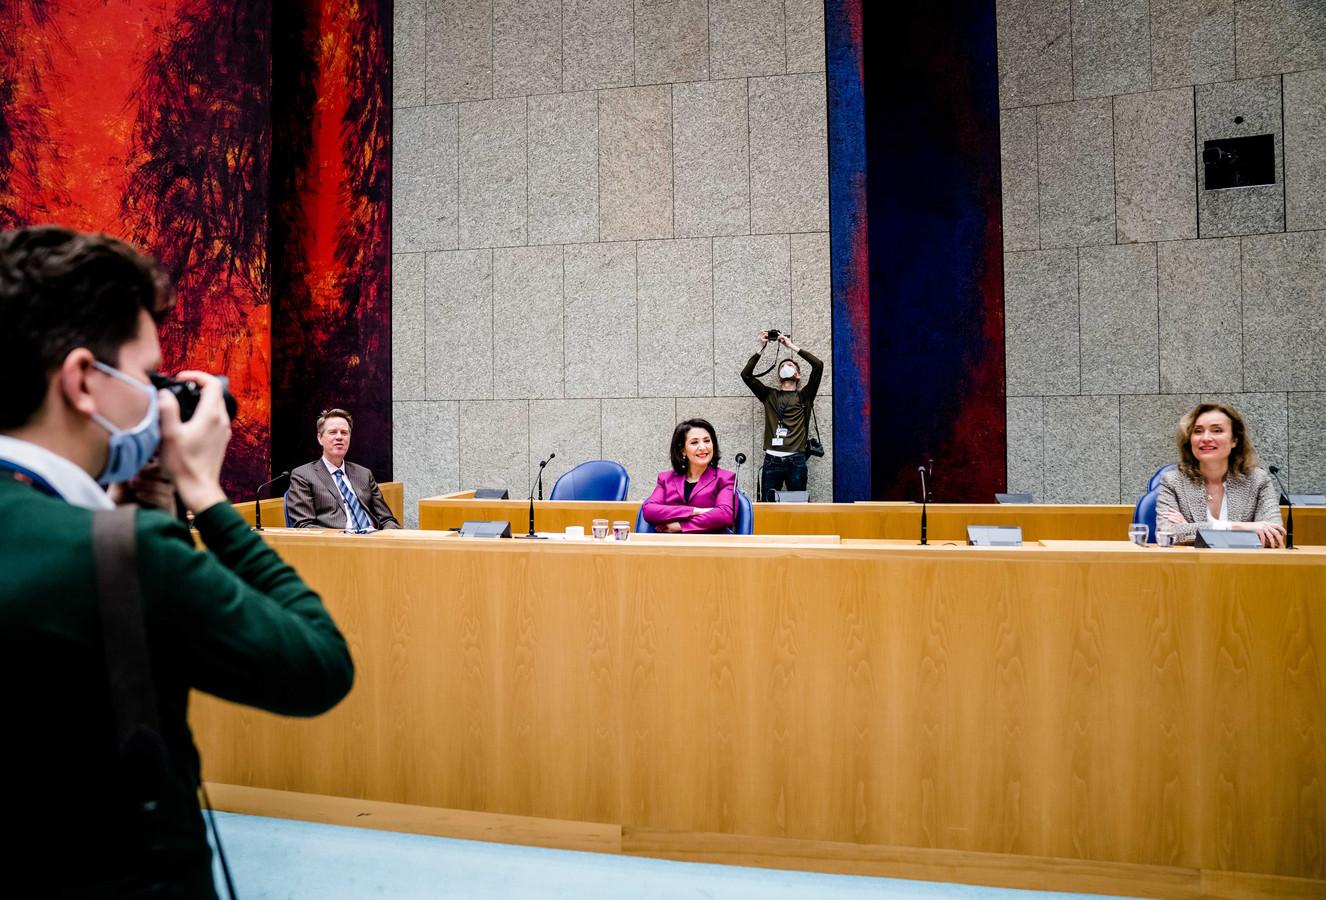 De drie kandidaat-Kamervoorzitters Martin Bosma (PVV), Khadija Arib (PvdA) en Vera Bergkamp (D66) voorafgaand aan het debat.